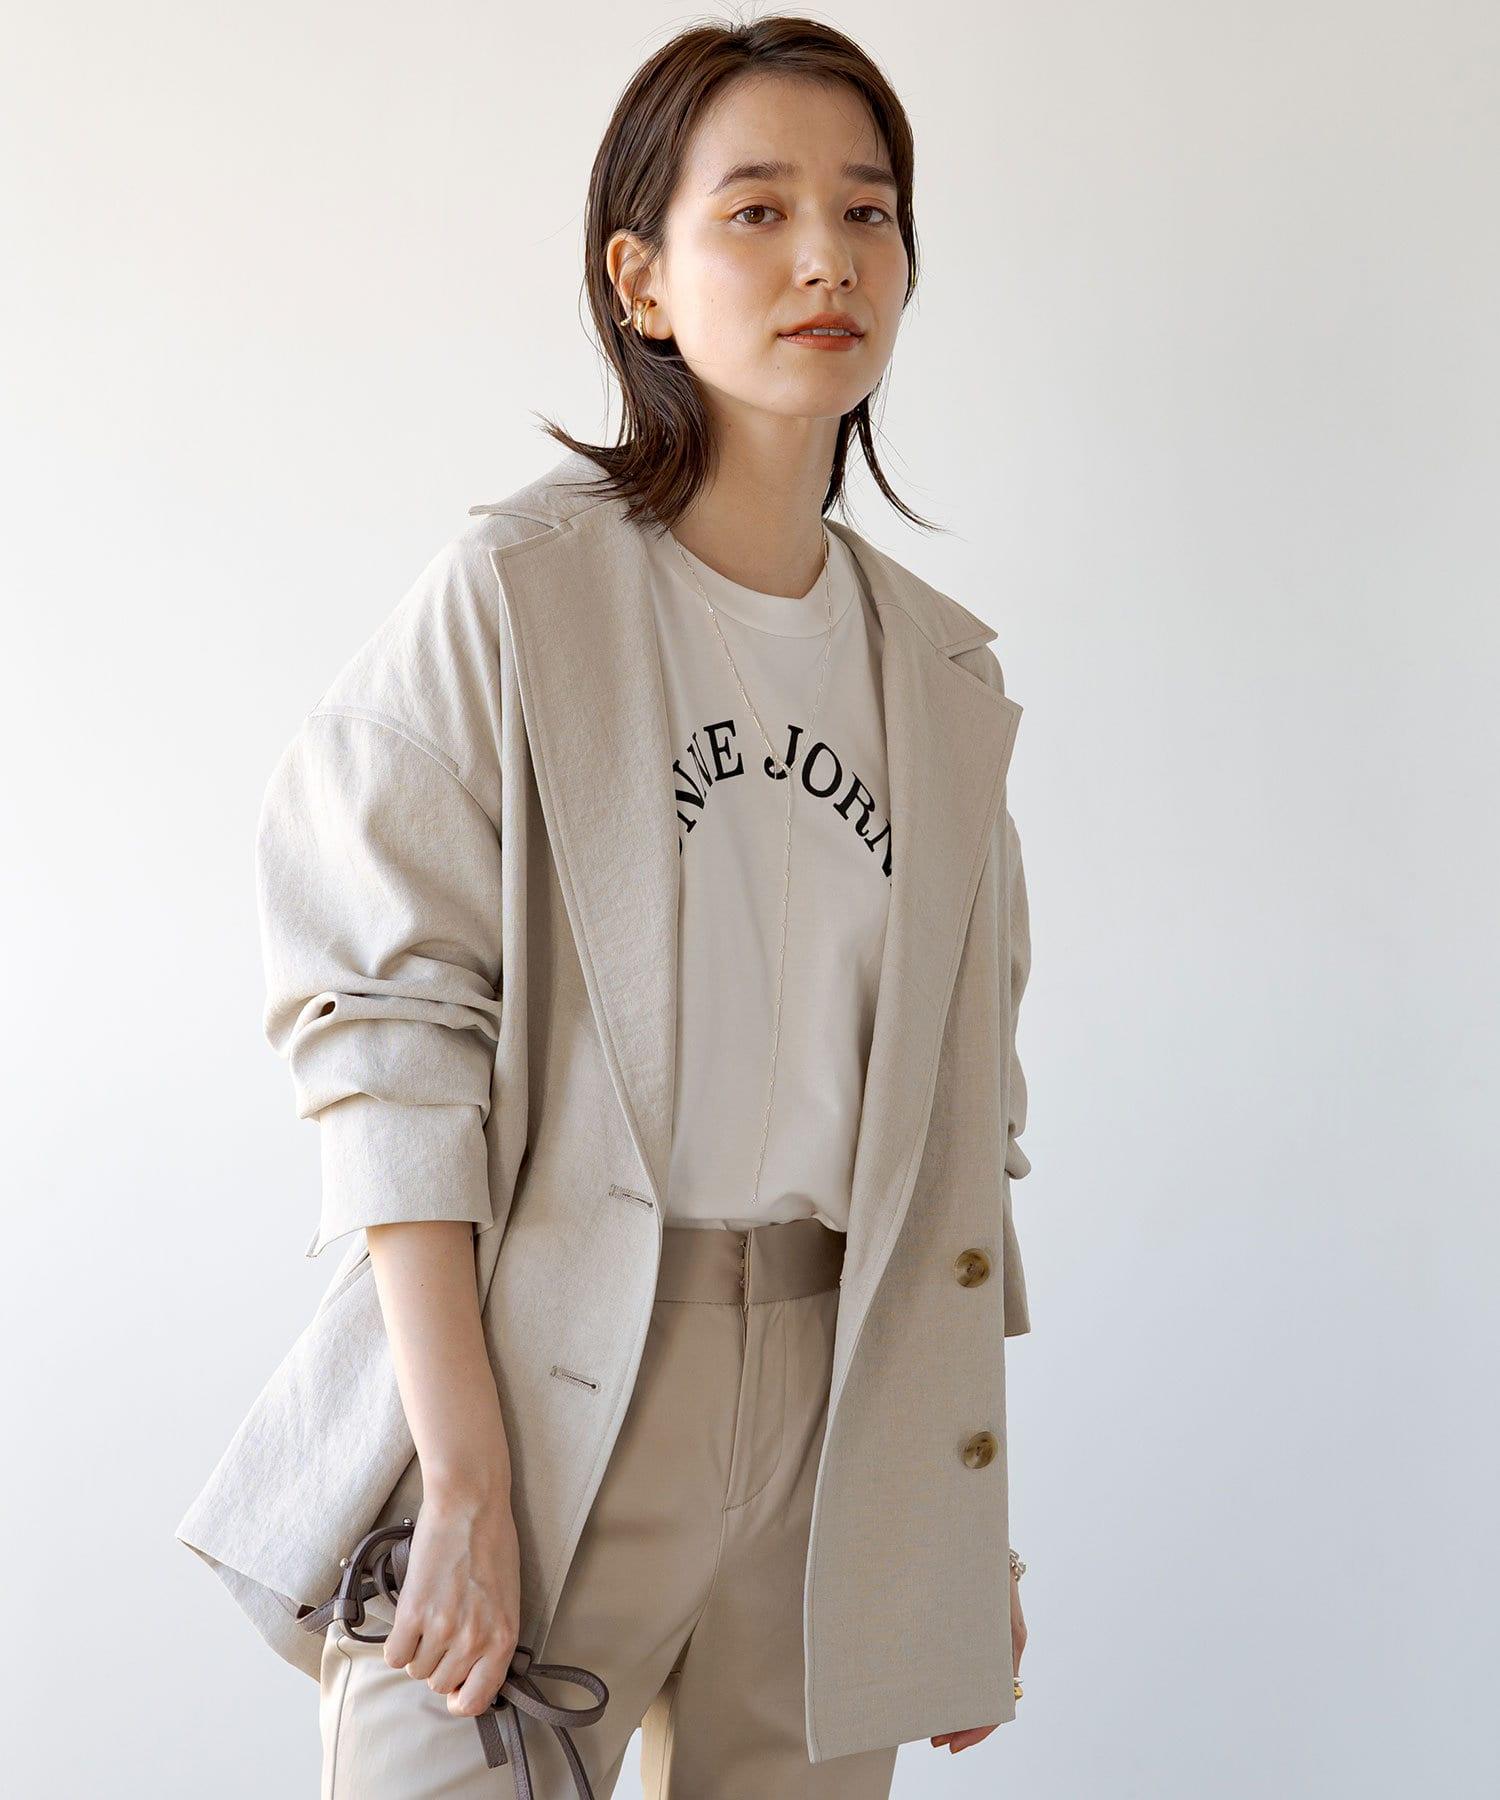 Loungedress(ラウンジドレス) シャンブレーオックスジャケット